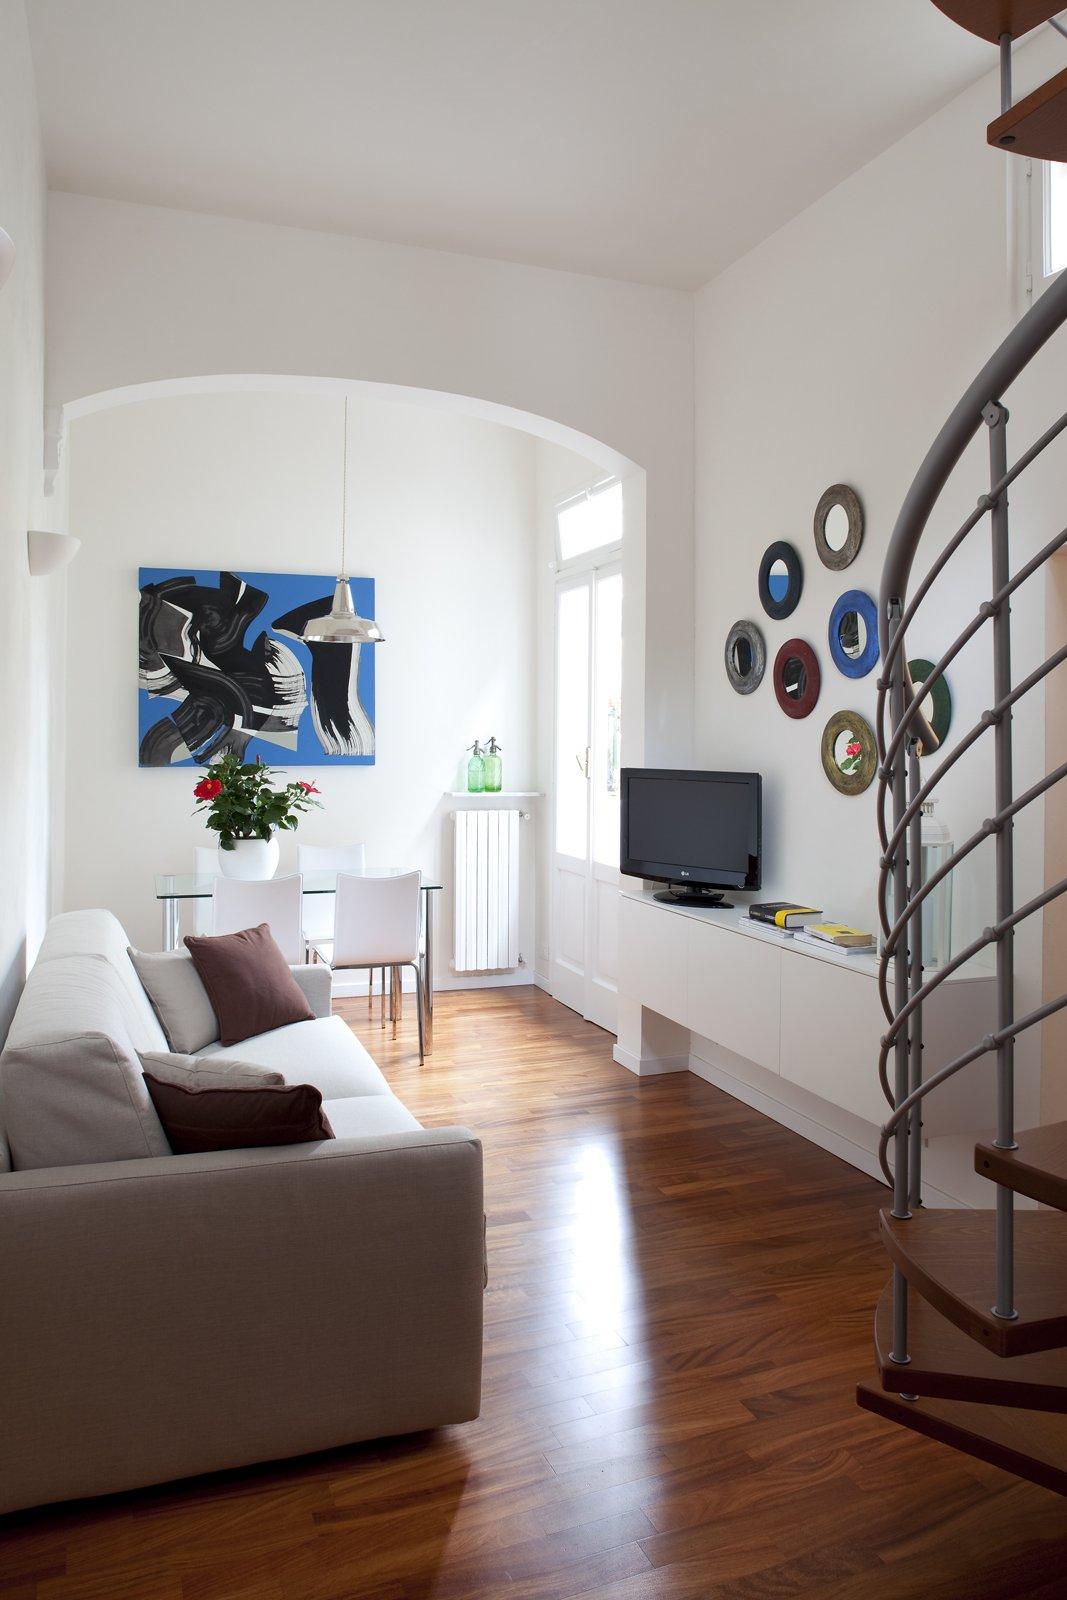 48 mq bilocale su due livelli cose di casa for Moderni disegni di case a due piani